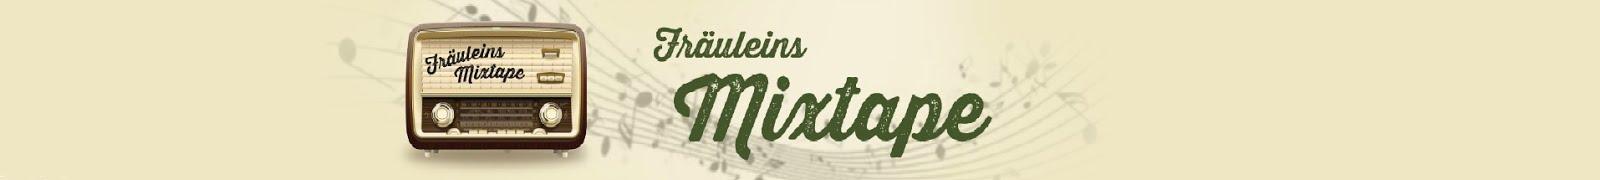 Fräuleins Mixtape